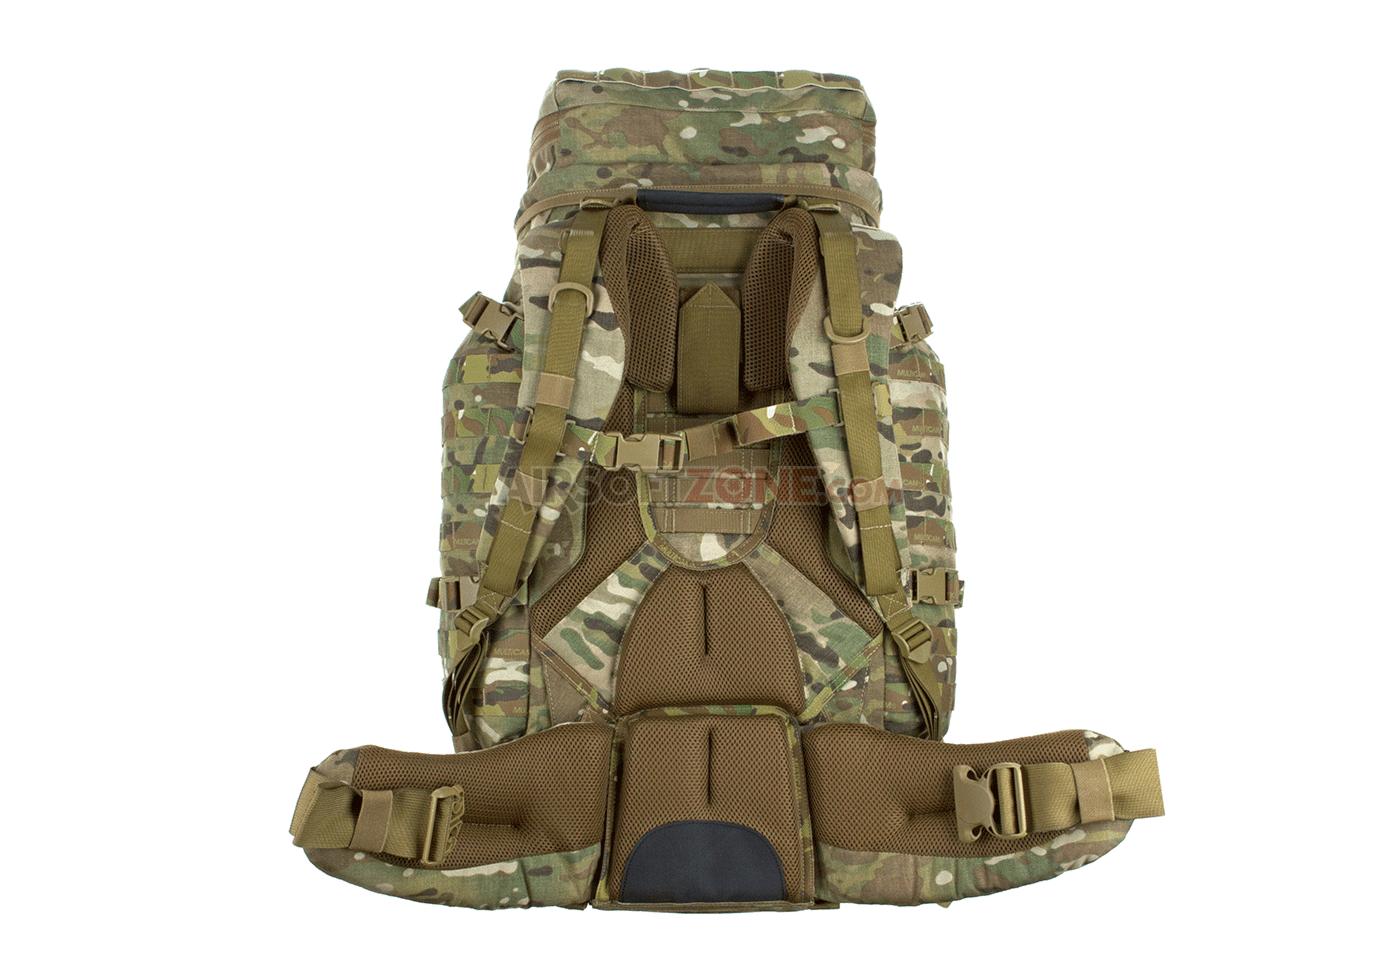 b9d0f395a1f X300 Long Range Patrol Pack Multicam (Warrior) - Backpacks - Load Bearing -  airsoftzone.com Online shop